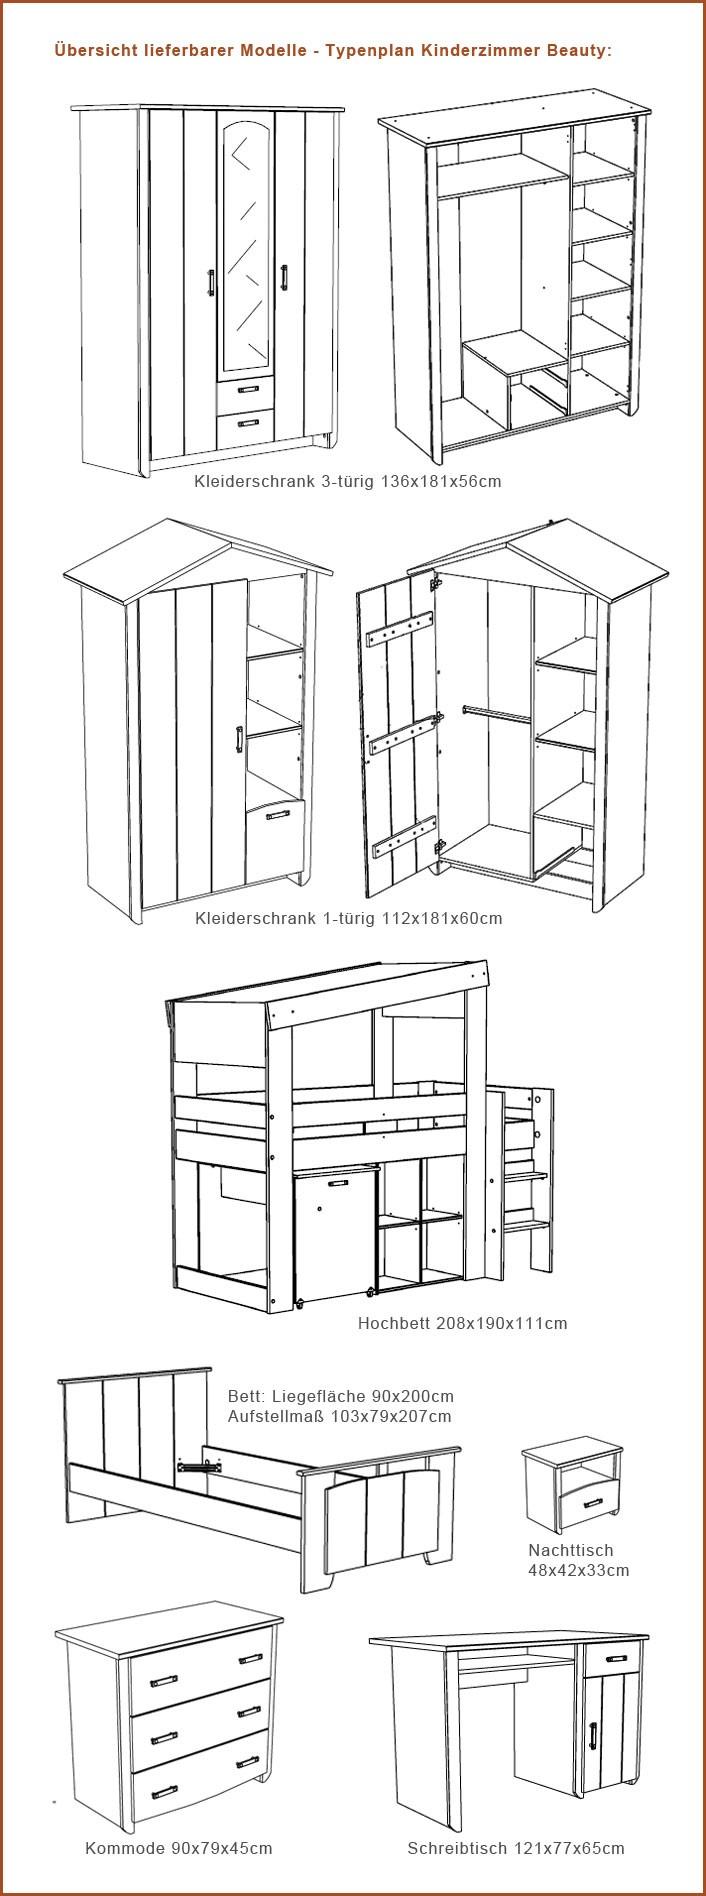 kleiderschrank beauty 9 112x181x60cm wei rosa. Black Bedroom Furniture Sets. Home Design Ideas